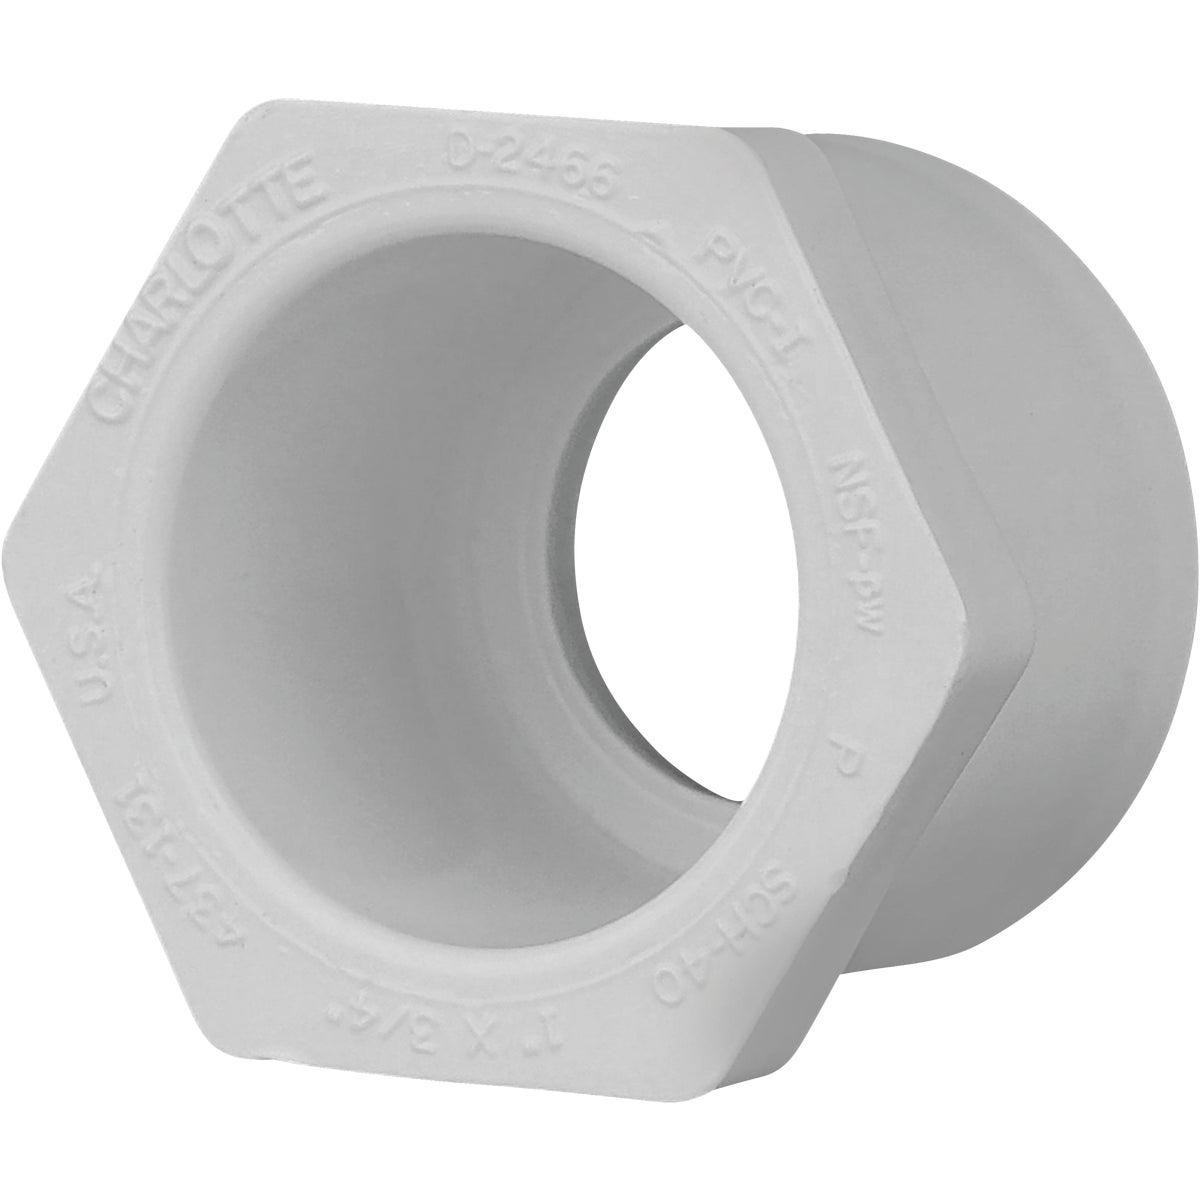 1X3/4 PVC SPXS BUSHING